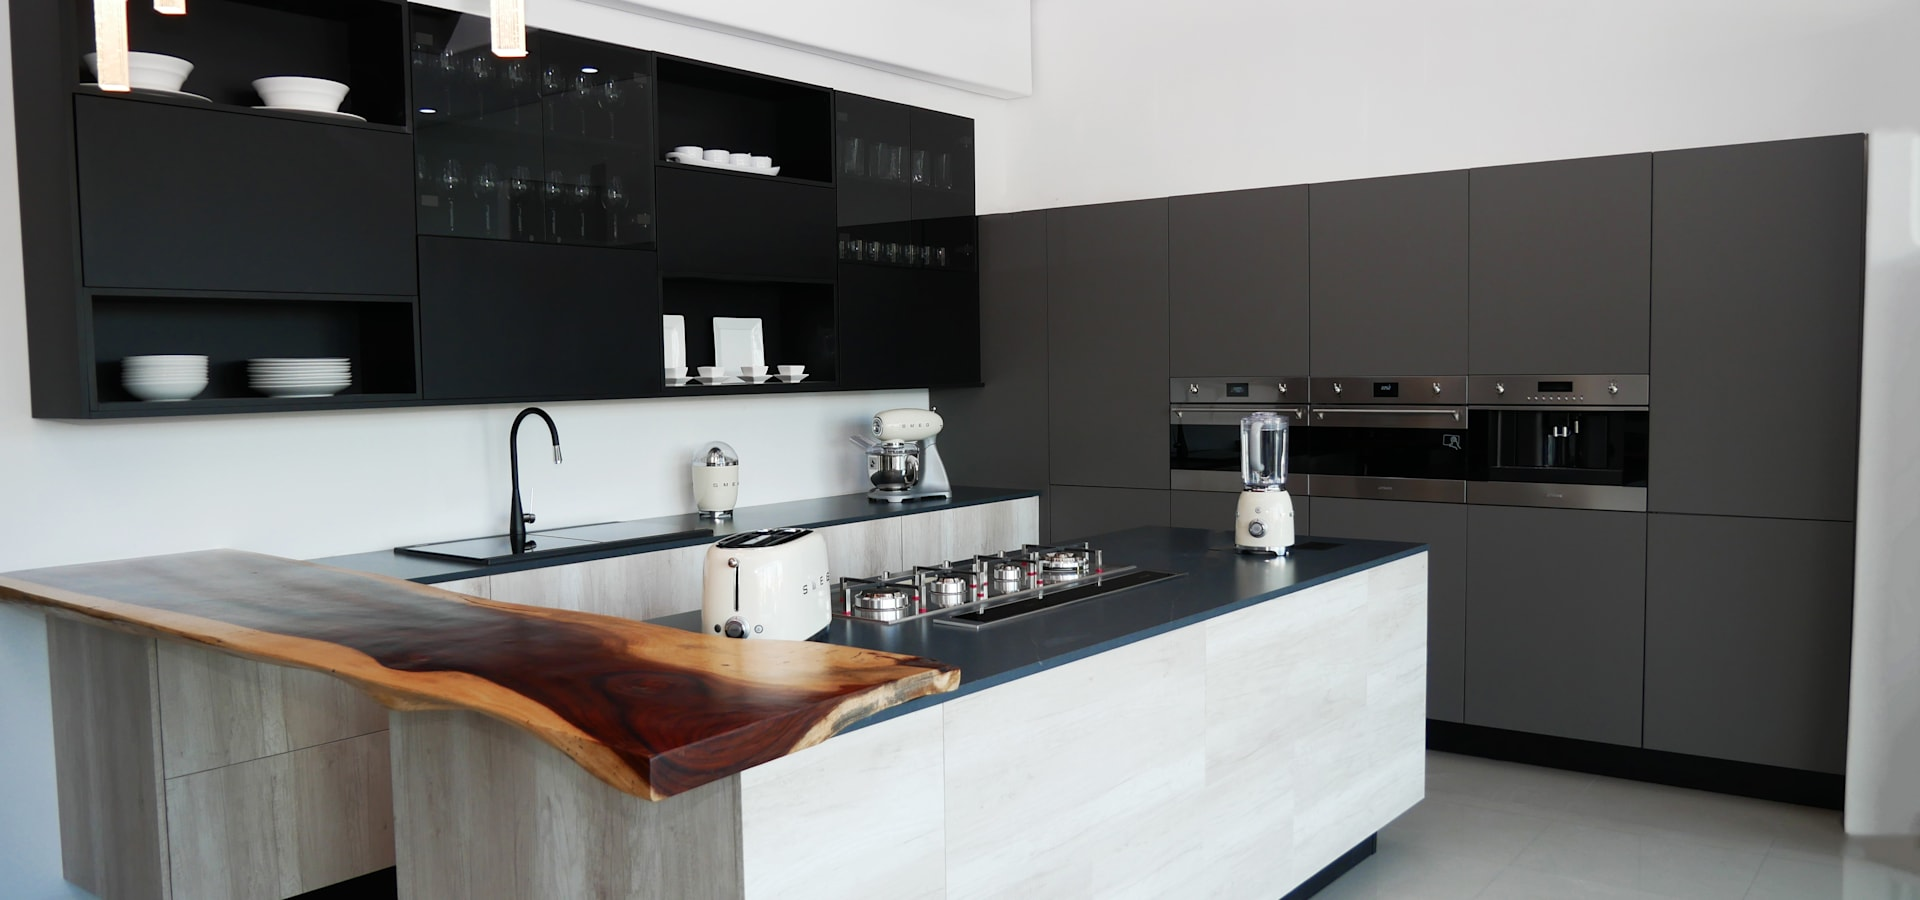 Keepler Kitchen & Closets